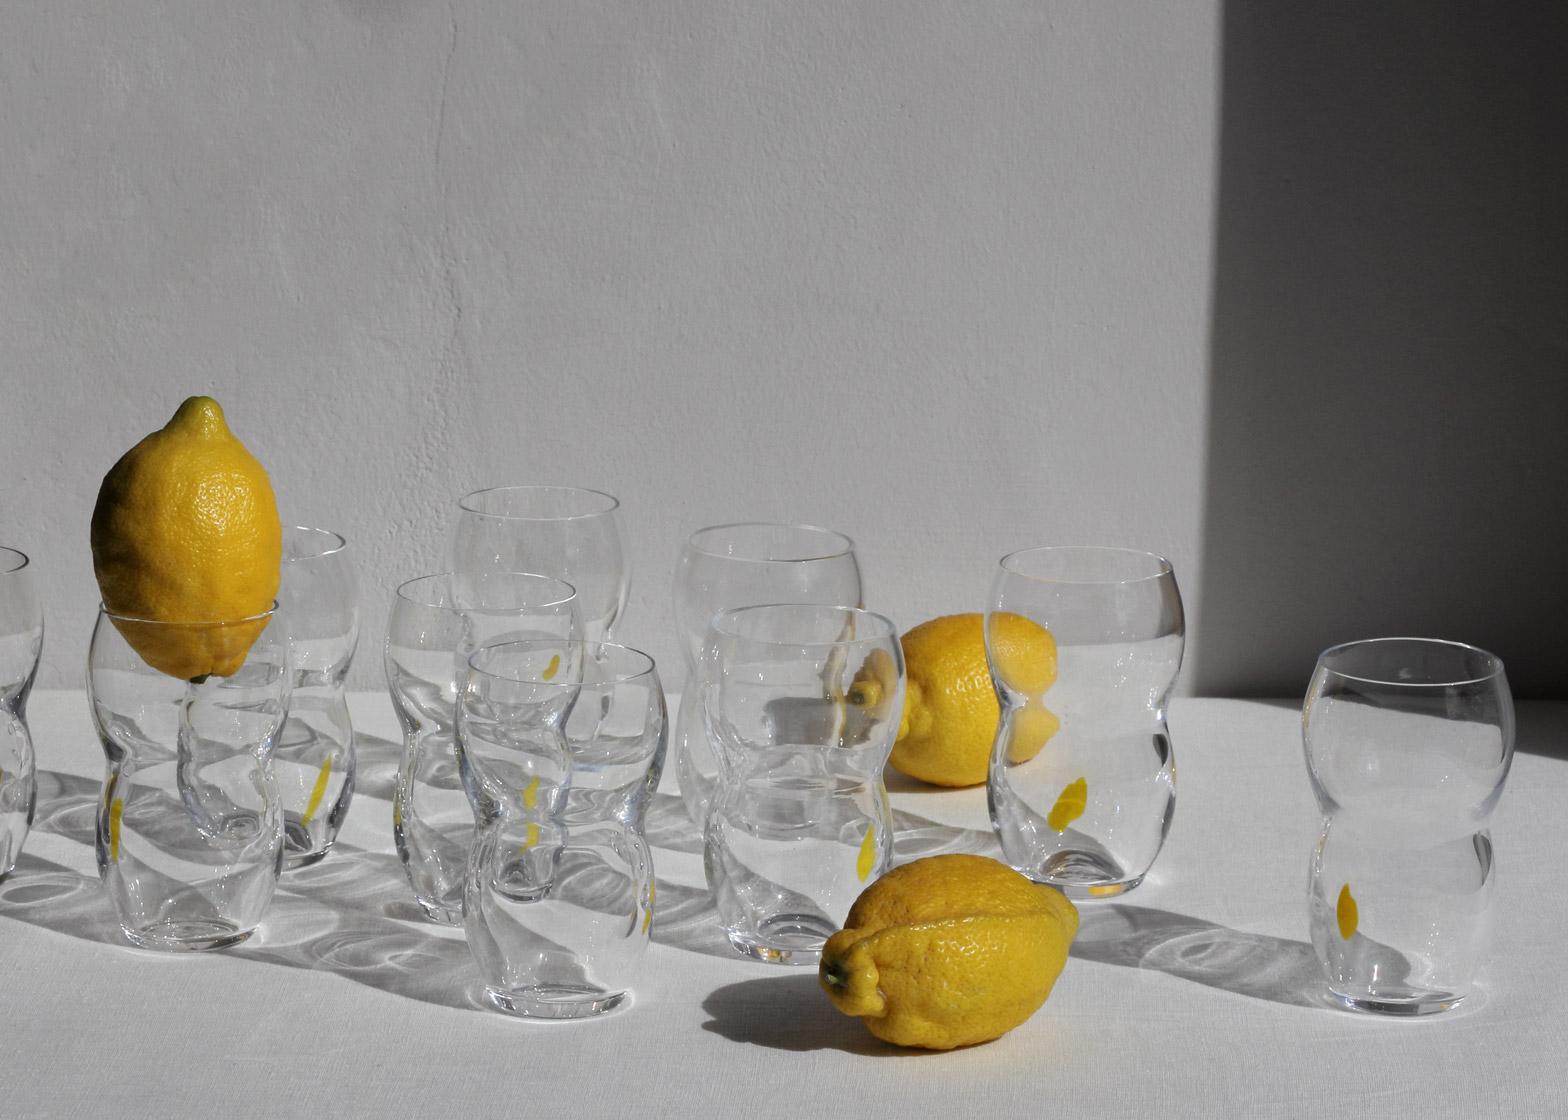 Lemonade Glass by Max Lamb